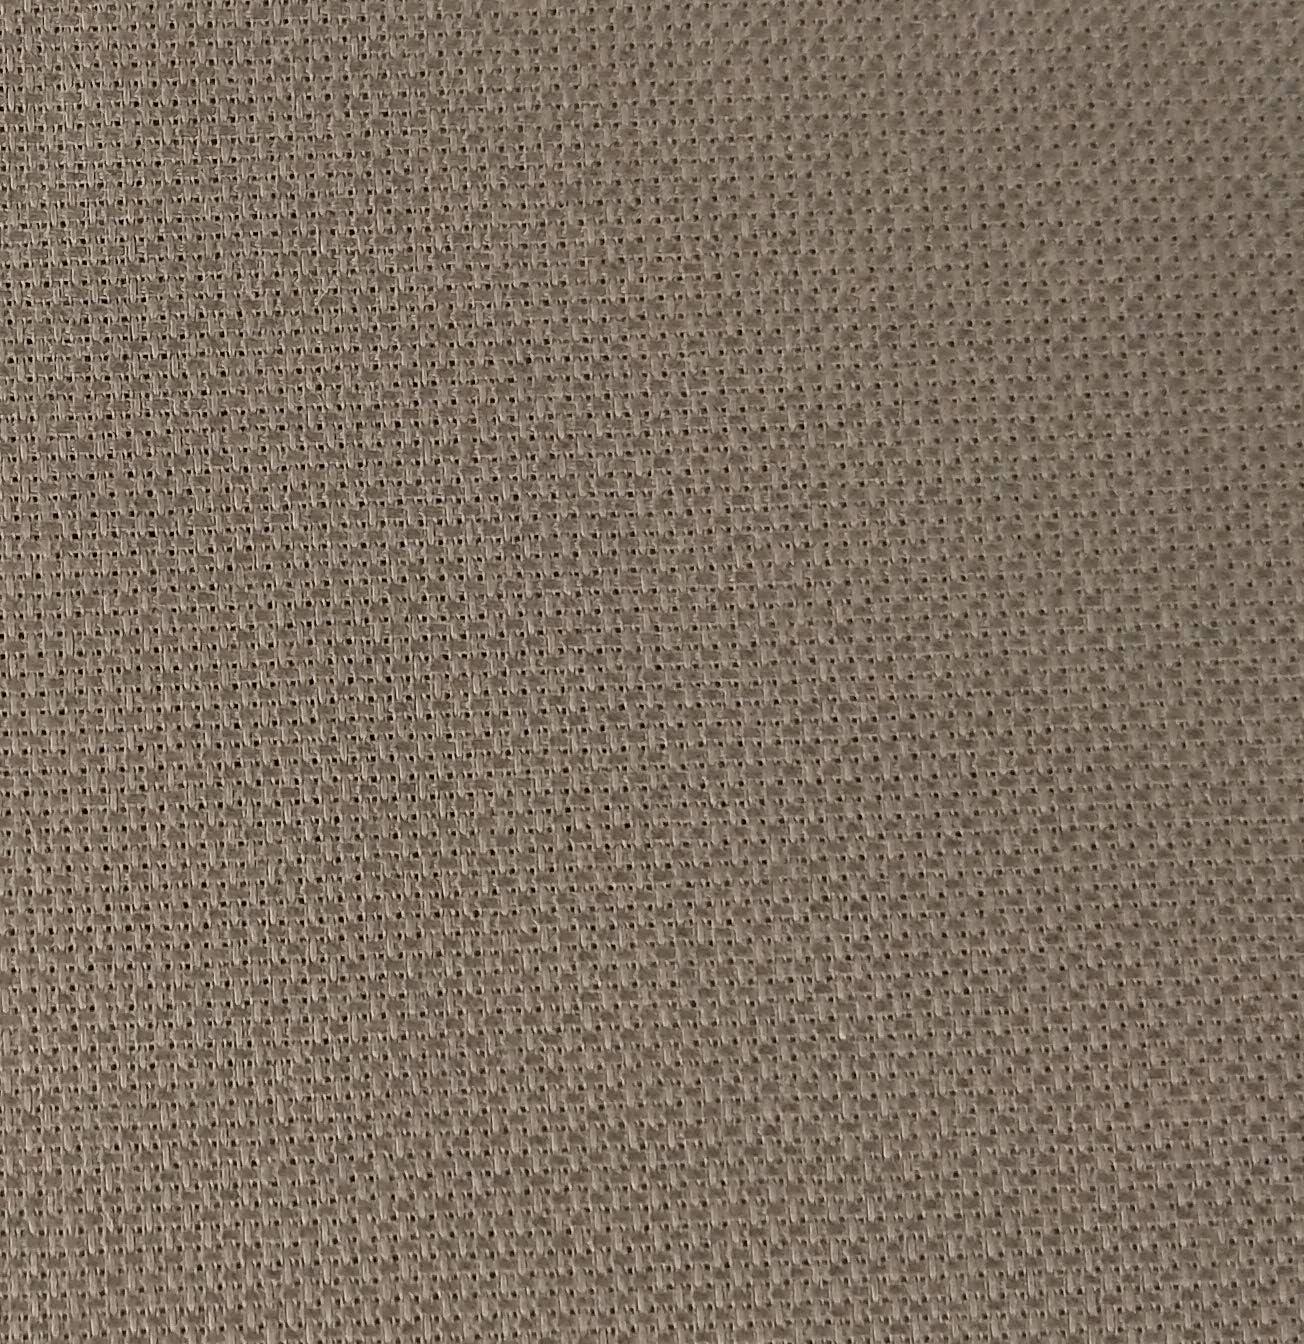 Light Green 19 x 28 14CT Counted Cotton Aida Cloth Cross Stitch Fabric